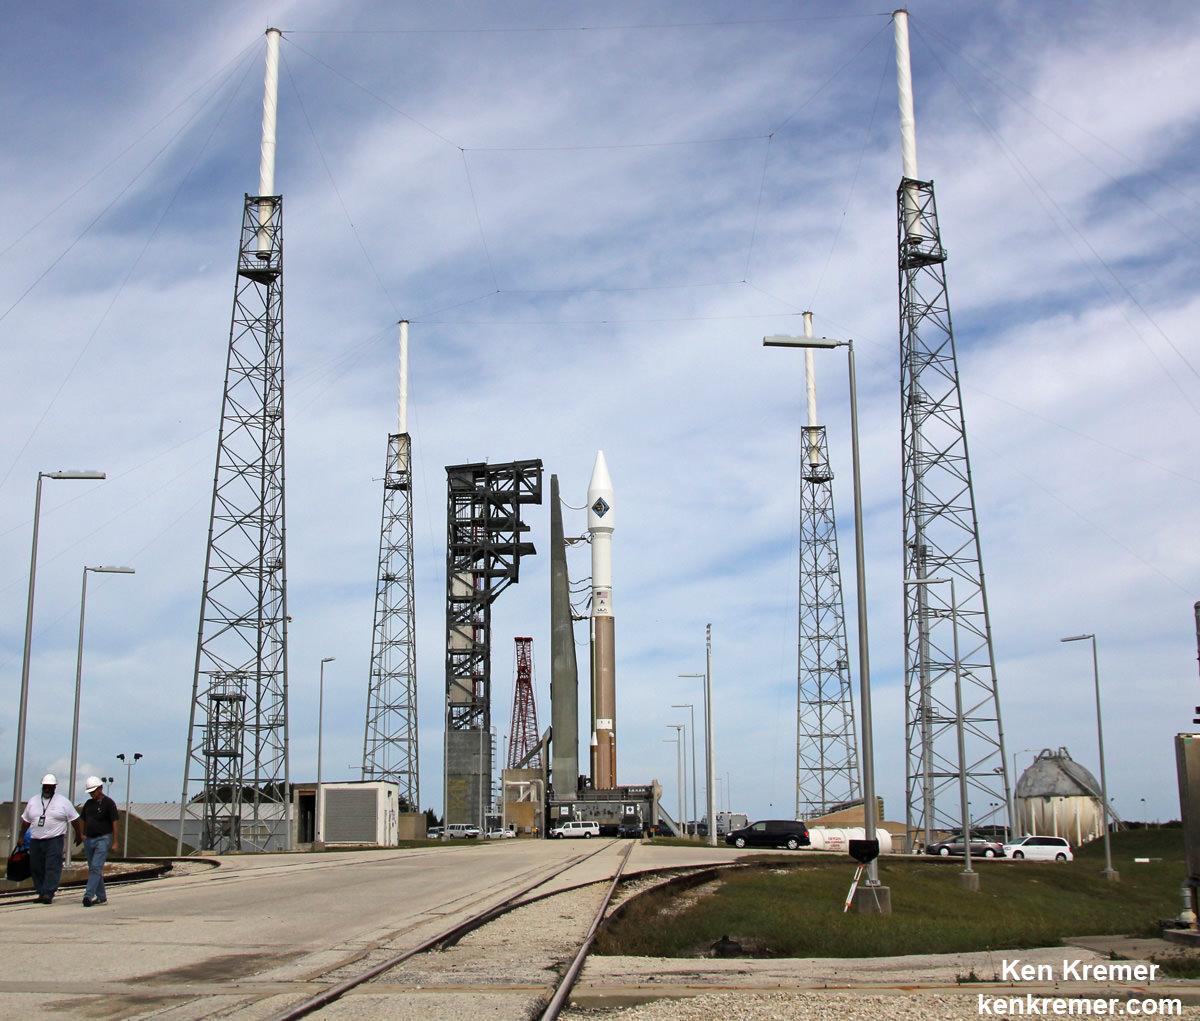 Orbital ATK Cygnus spacecraft poised for blastoff  to ISS on  ULA Atlas V on Dec. 3, 2015 from Cape Canaveral Air Force Station, Florida.  Credit: Ken Kremer/kenkremer.com